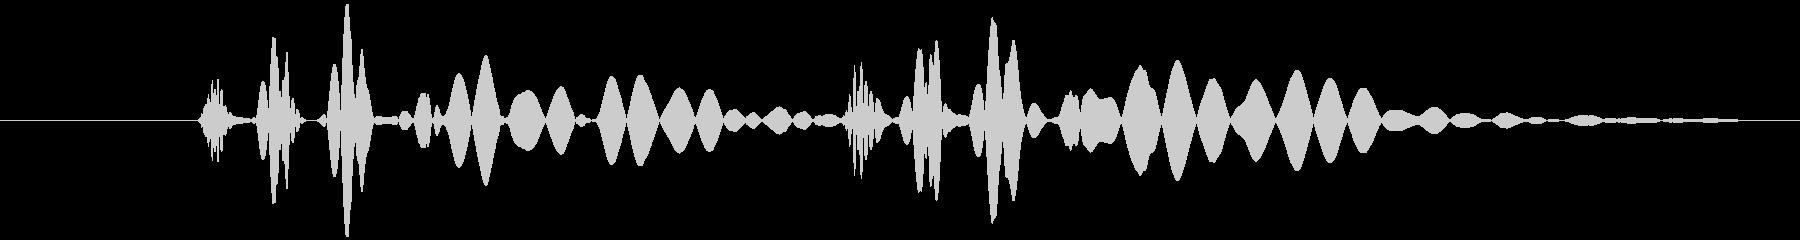 心臓 鼓動 単音の未再生の波形